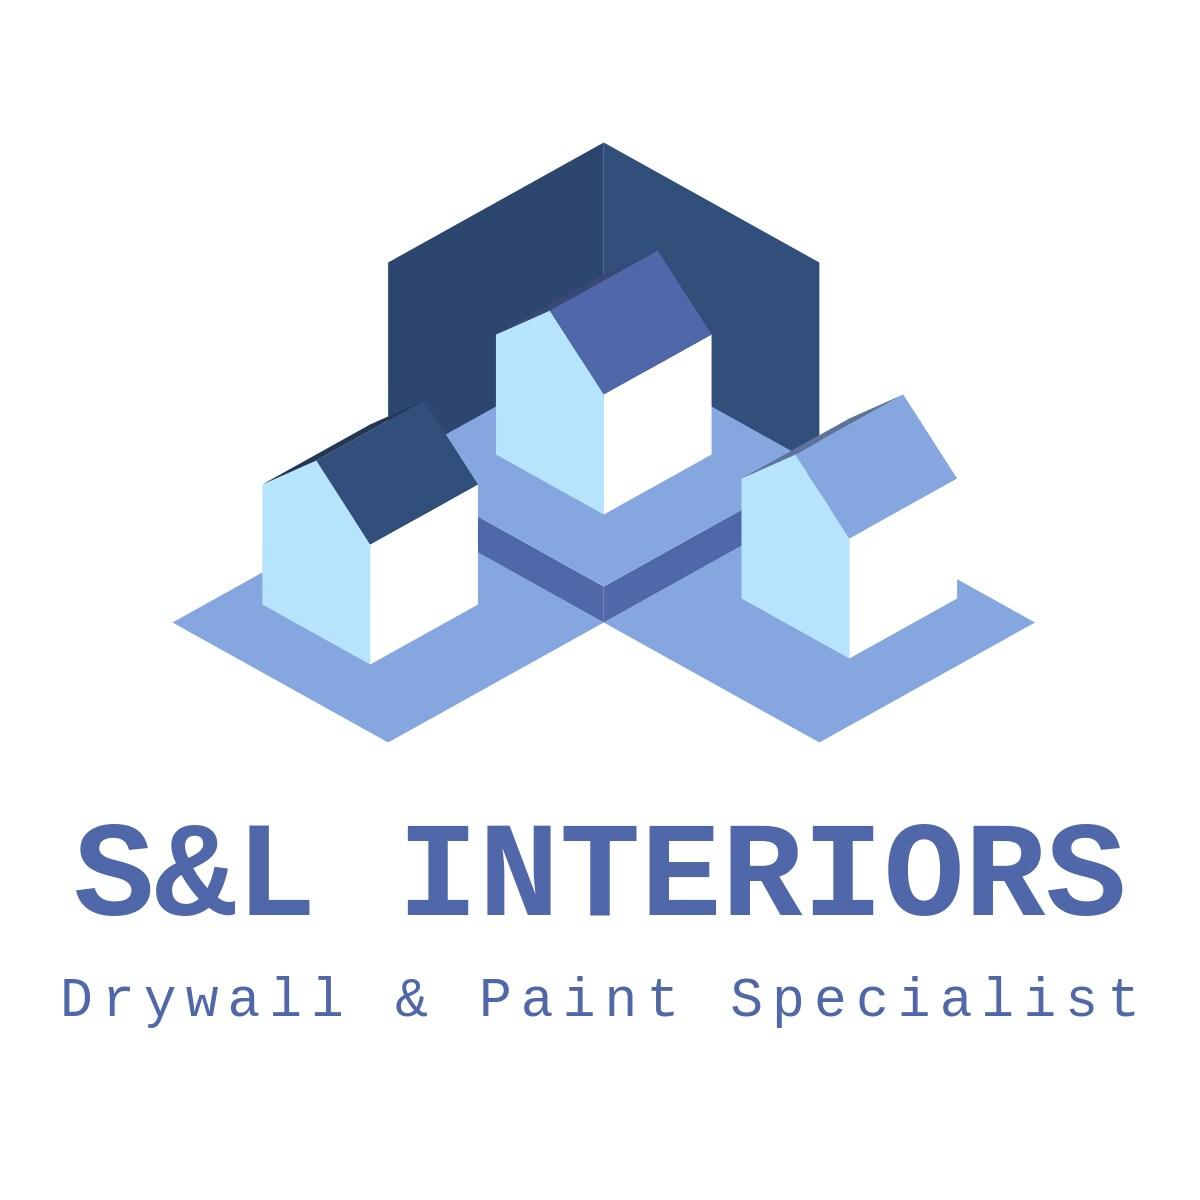 S&L Interiors